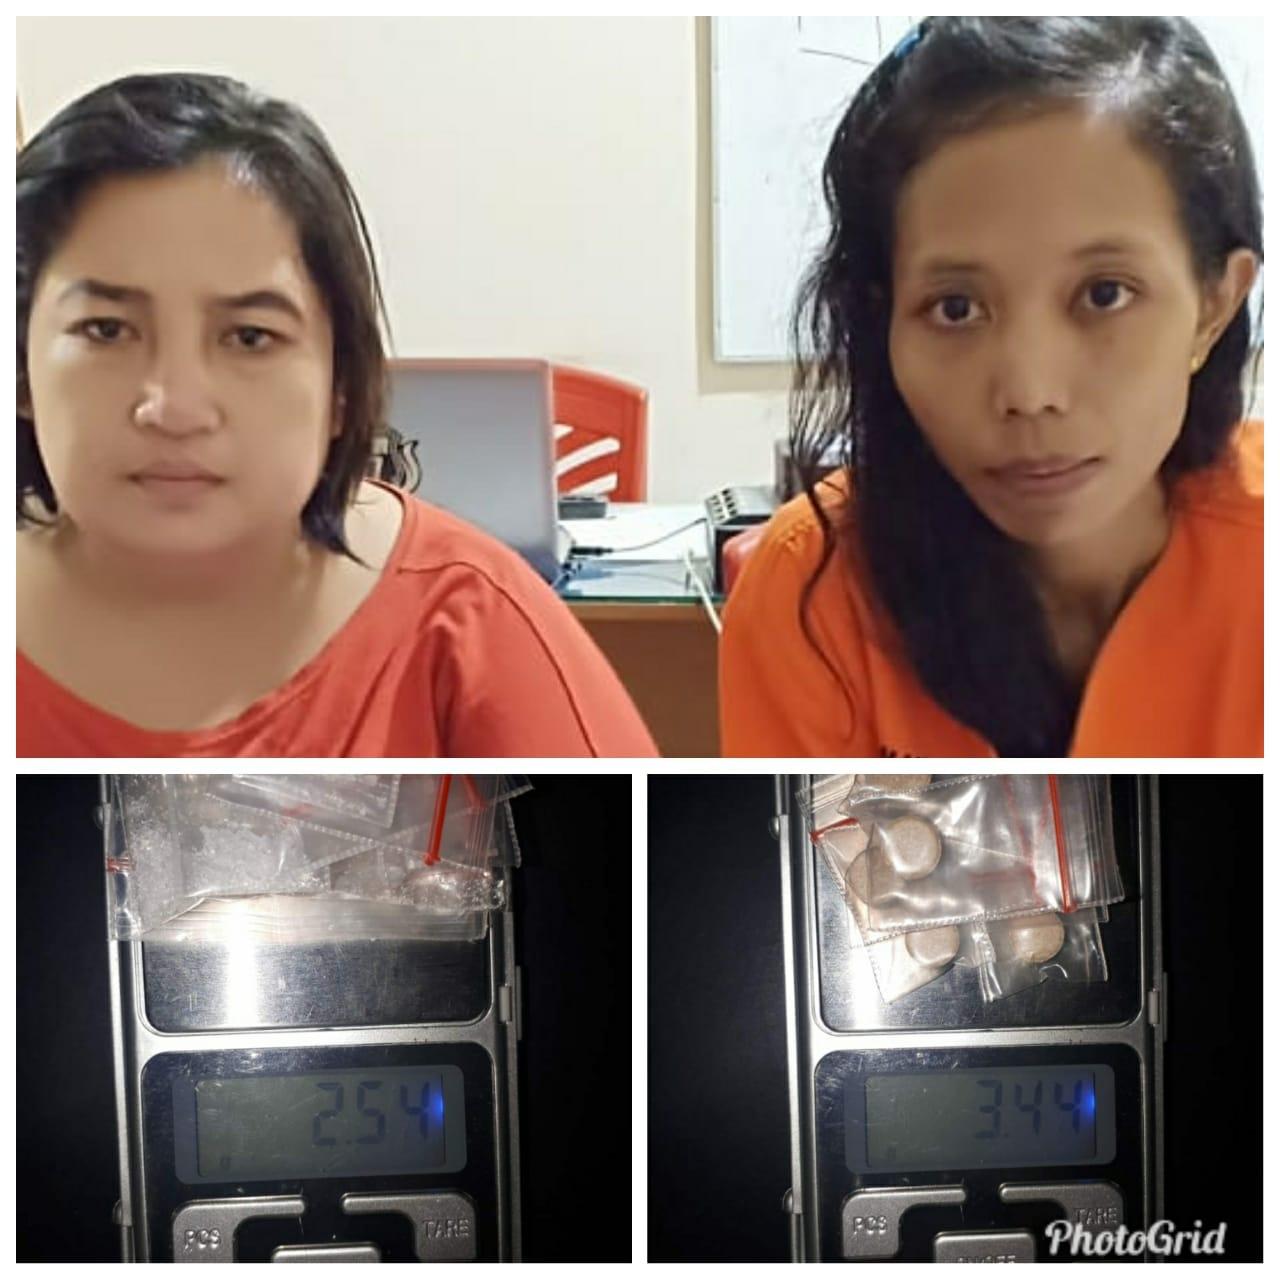 Simpan Narkoba Di Kafe, Dua Wanita Diamankan